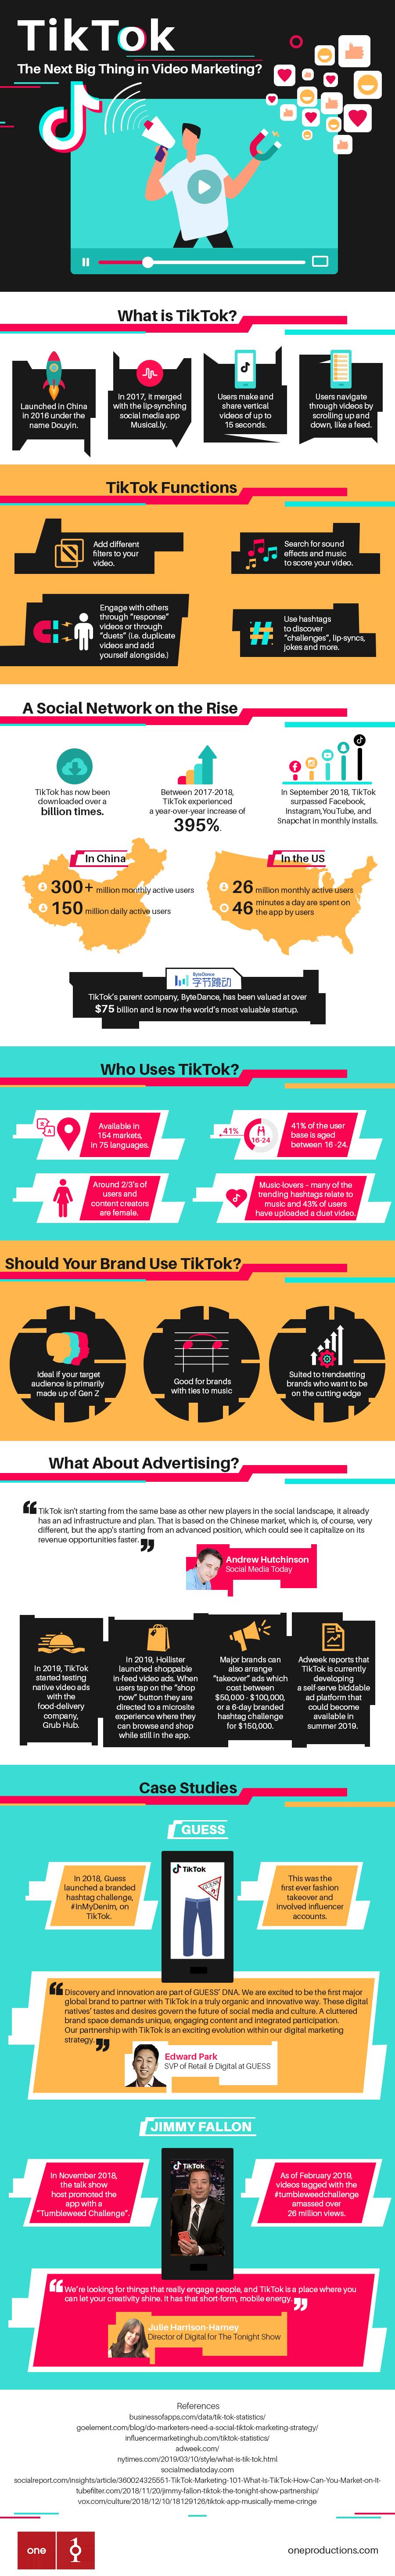 Infographic- Tik Tok